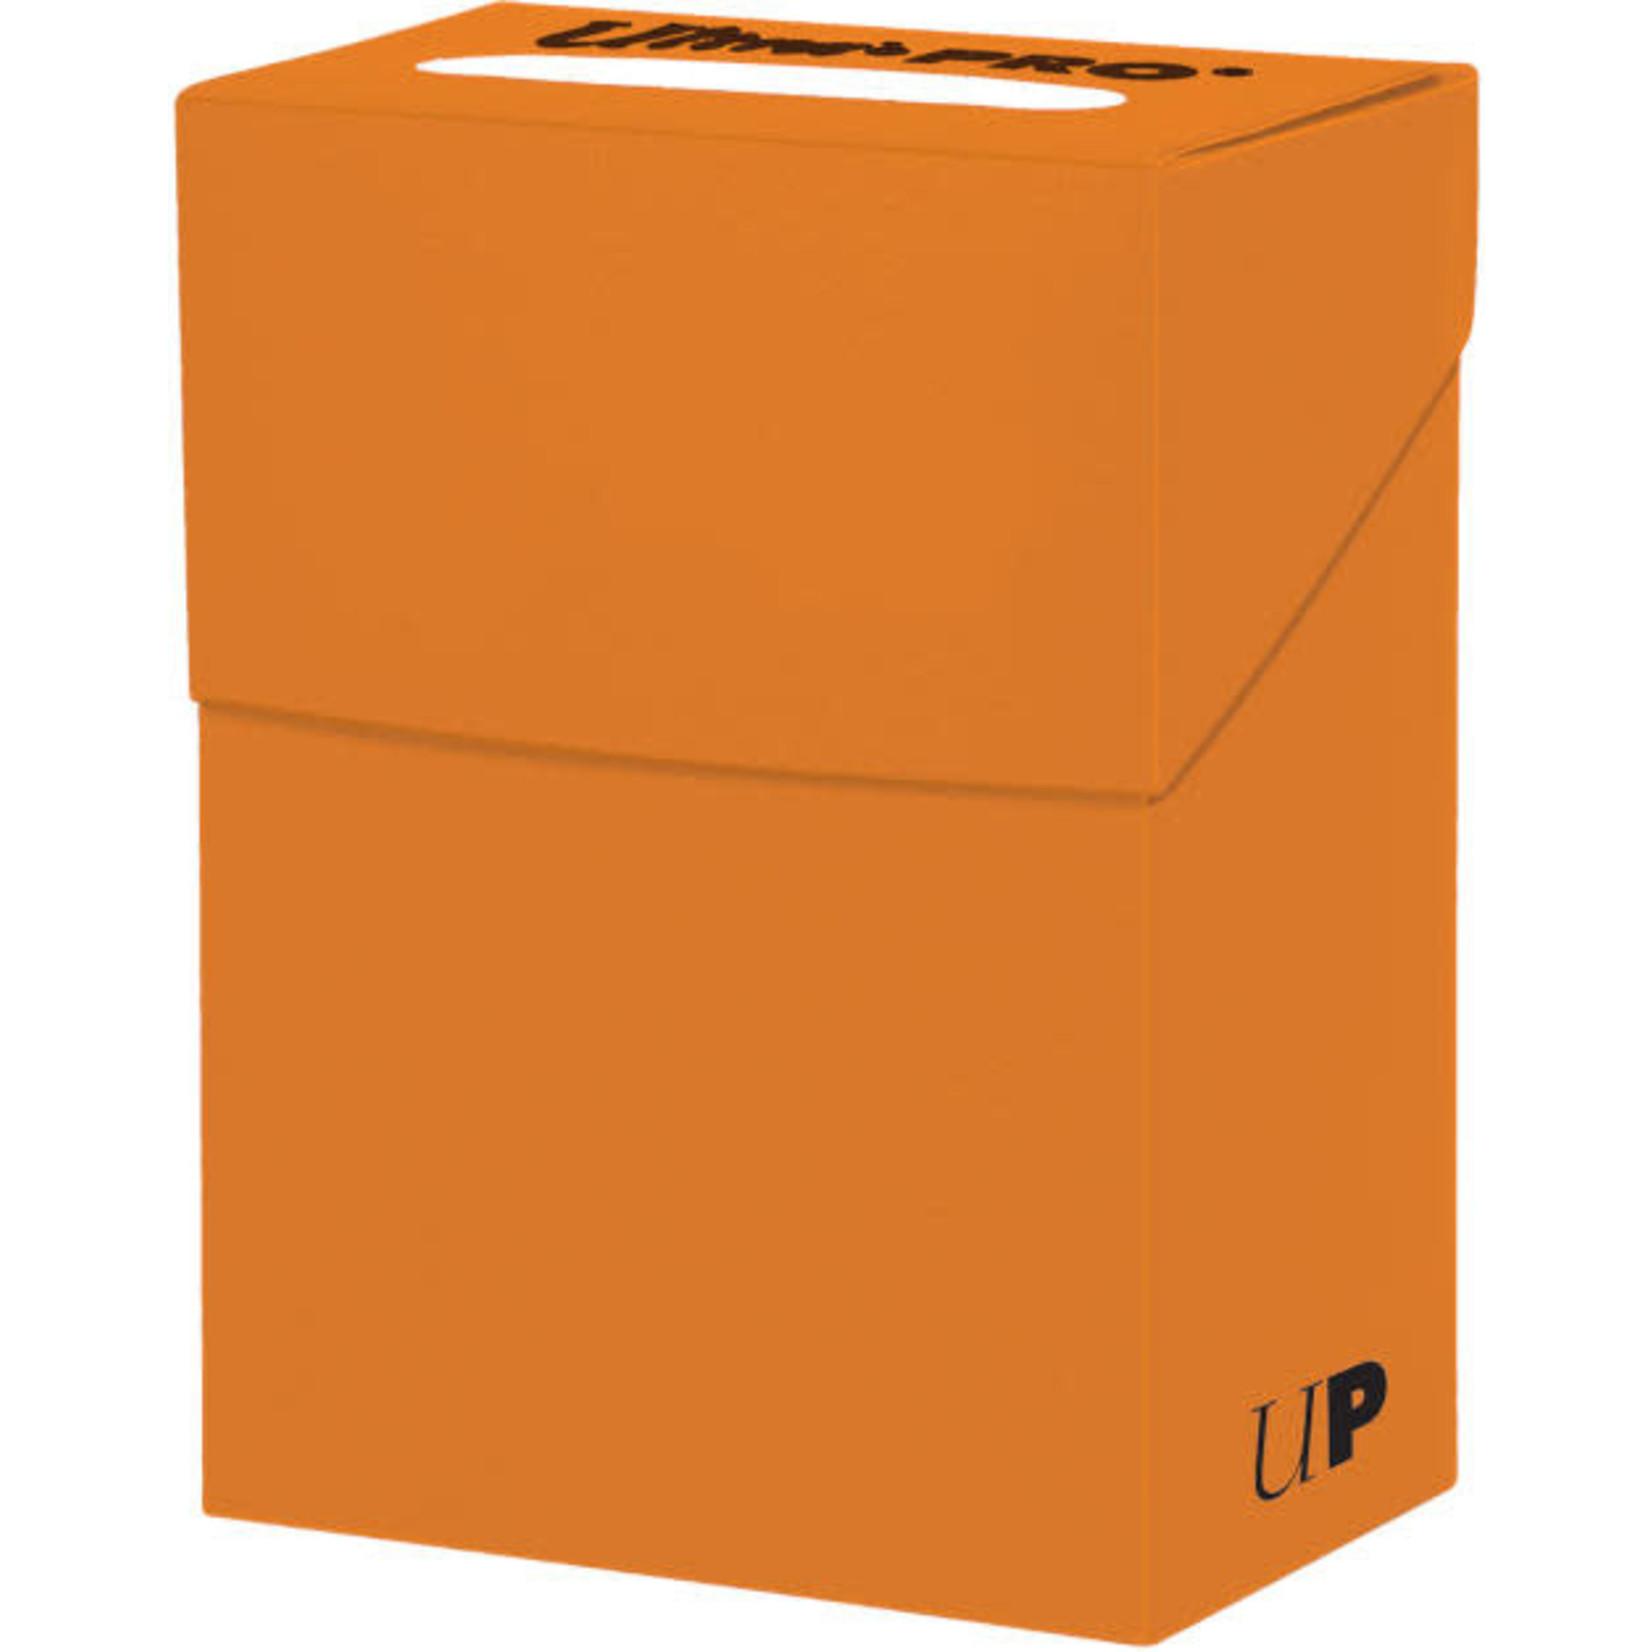 Solid Orange Deck Box